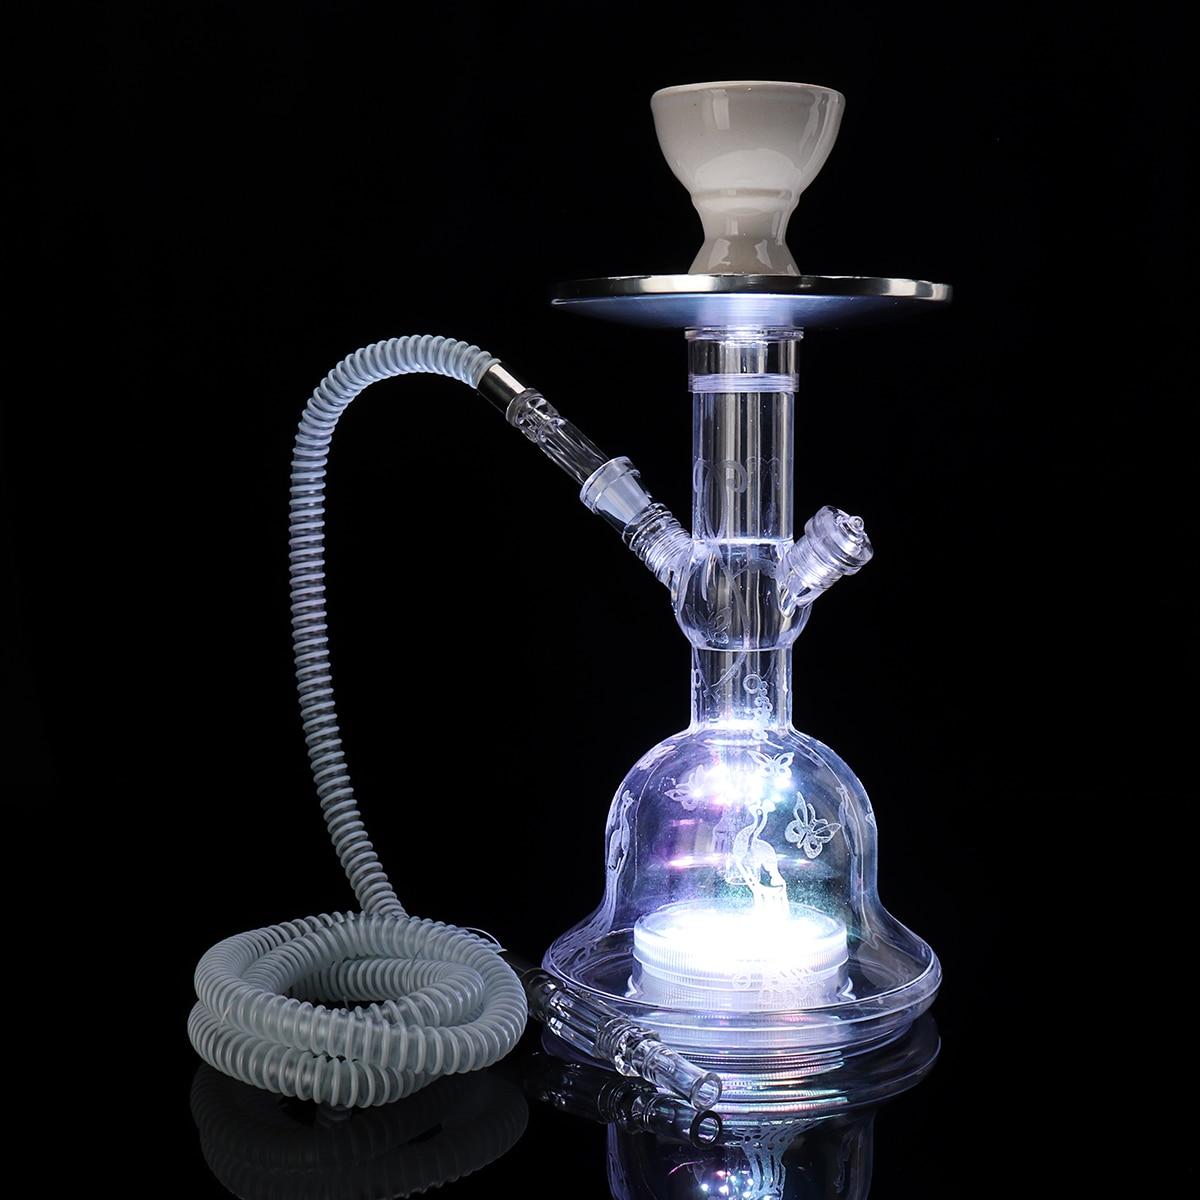 Acrylic LED Light Shisha Pipe Set Narguile Hookah With Chicha Plastic Hose Ceramic Tobacco Flavors Bowl Charcoal Tongs